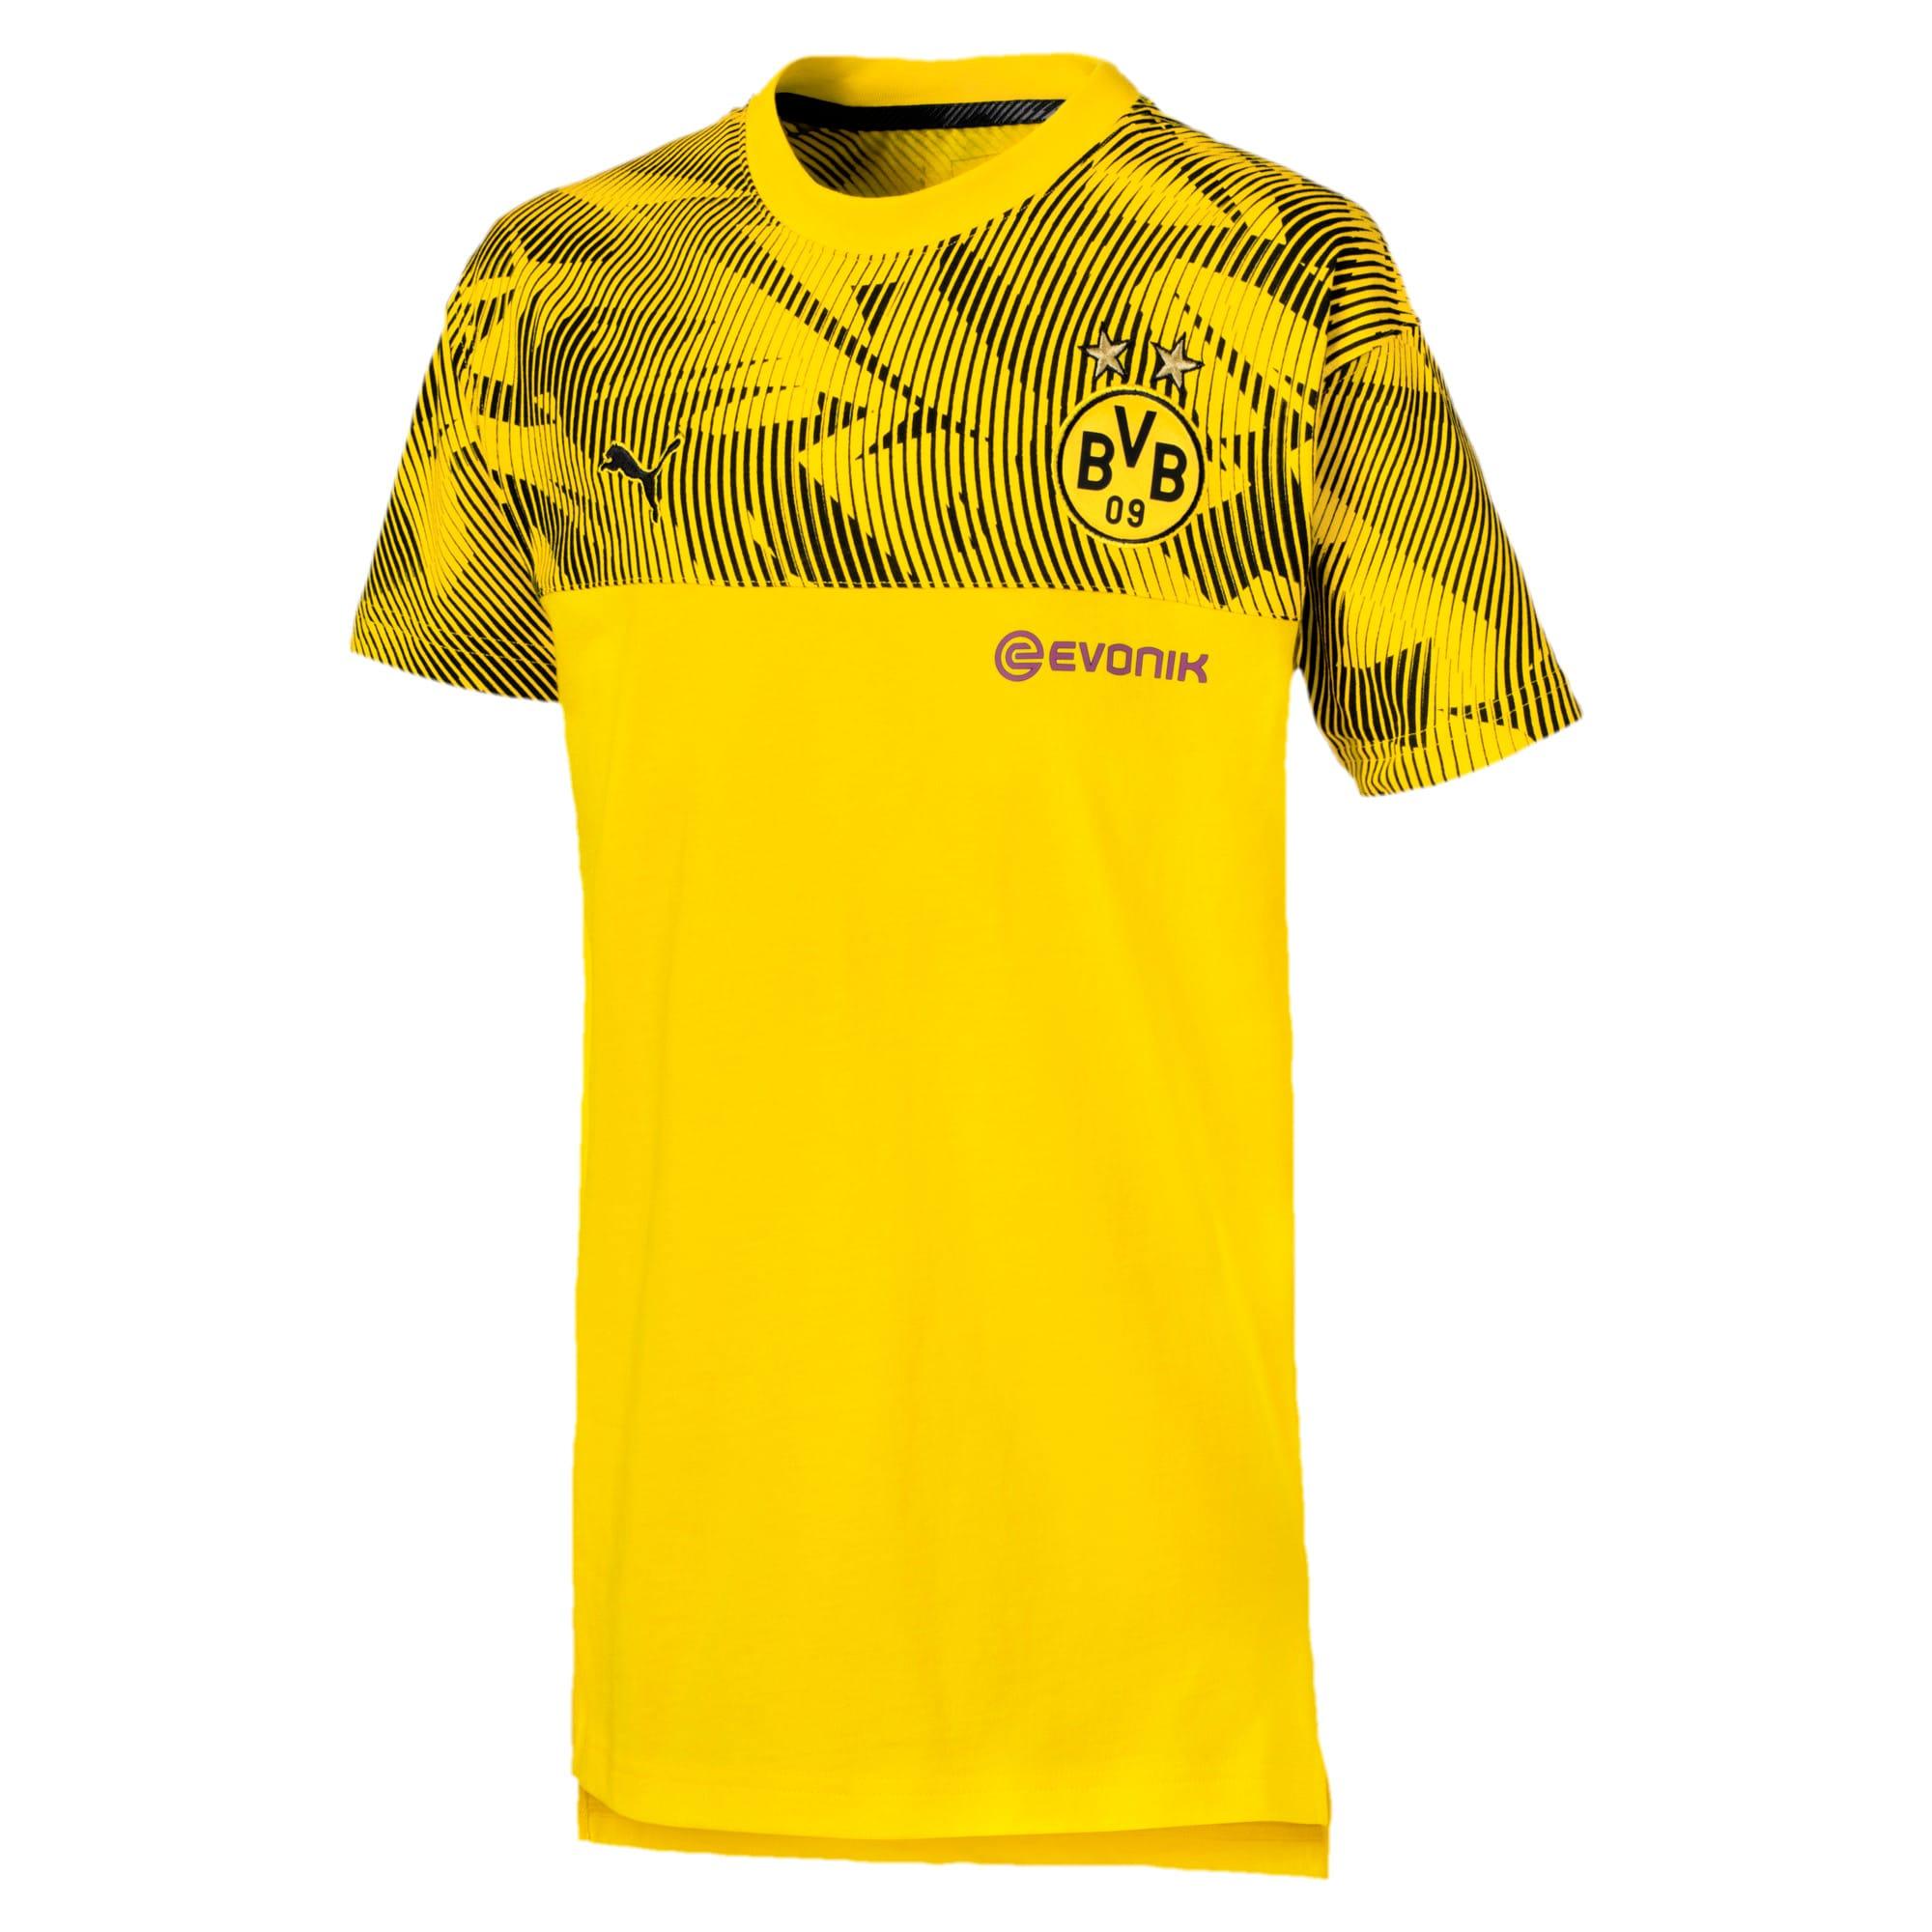 Thumbnail 1 of BVB Casuals Kinder T-Shirt, Cyber Yellow-Puma Black, medium